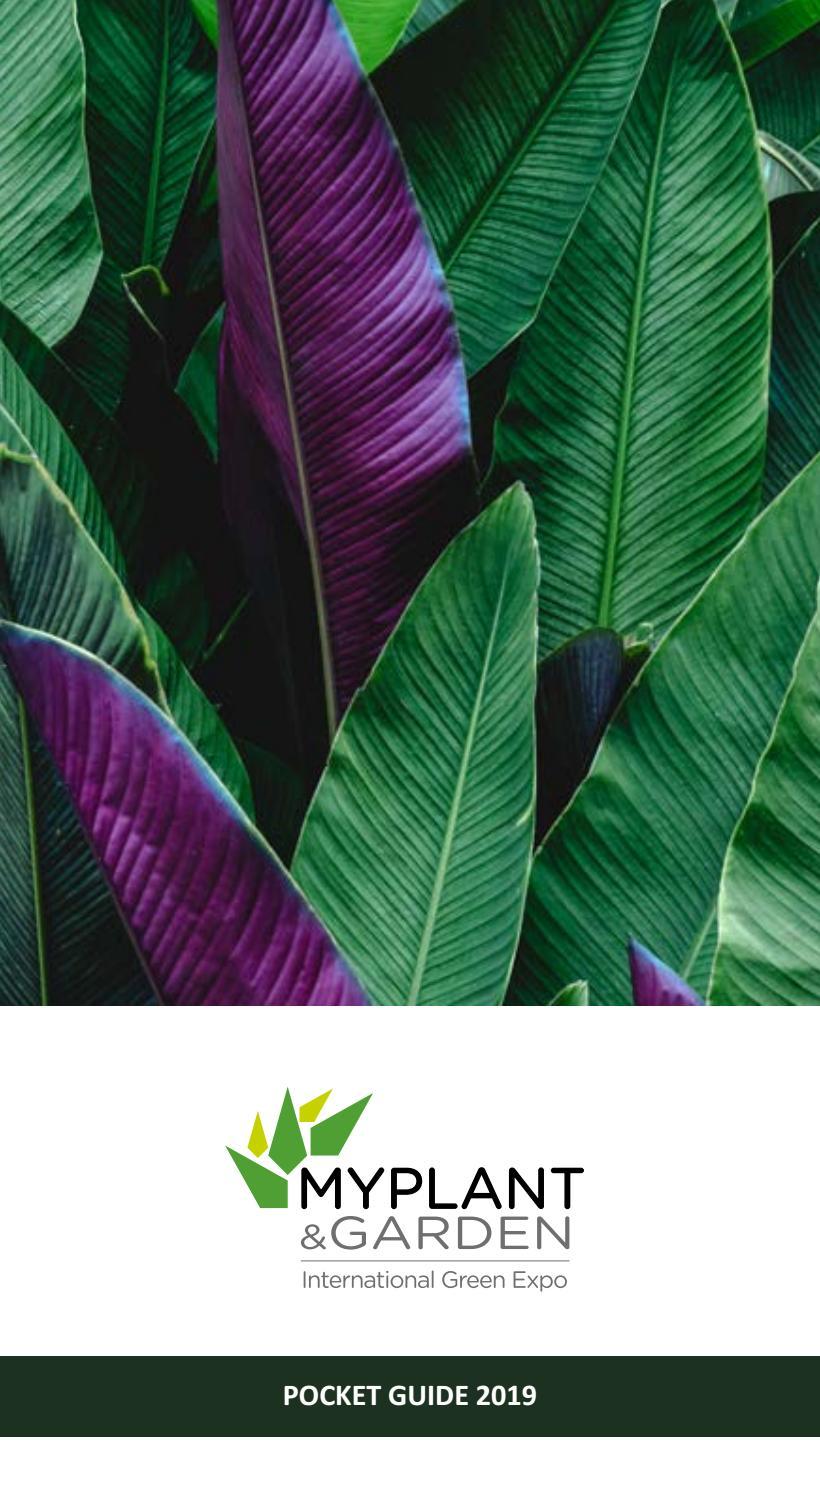 Ingrosso Tappeti San Giuseppe Vesuviano catalogo myplant & garden 2019 by myplant & garden - issuu